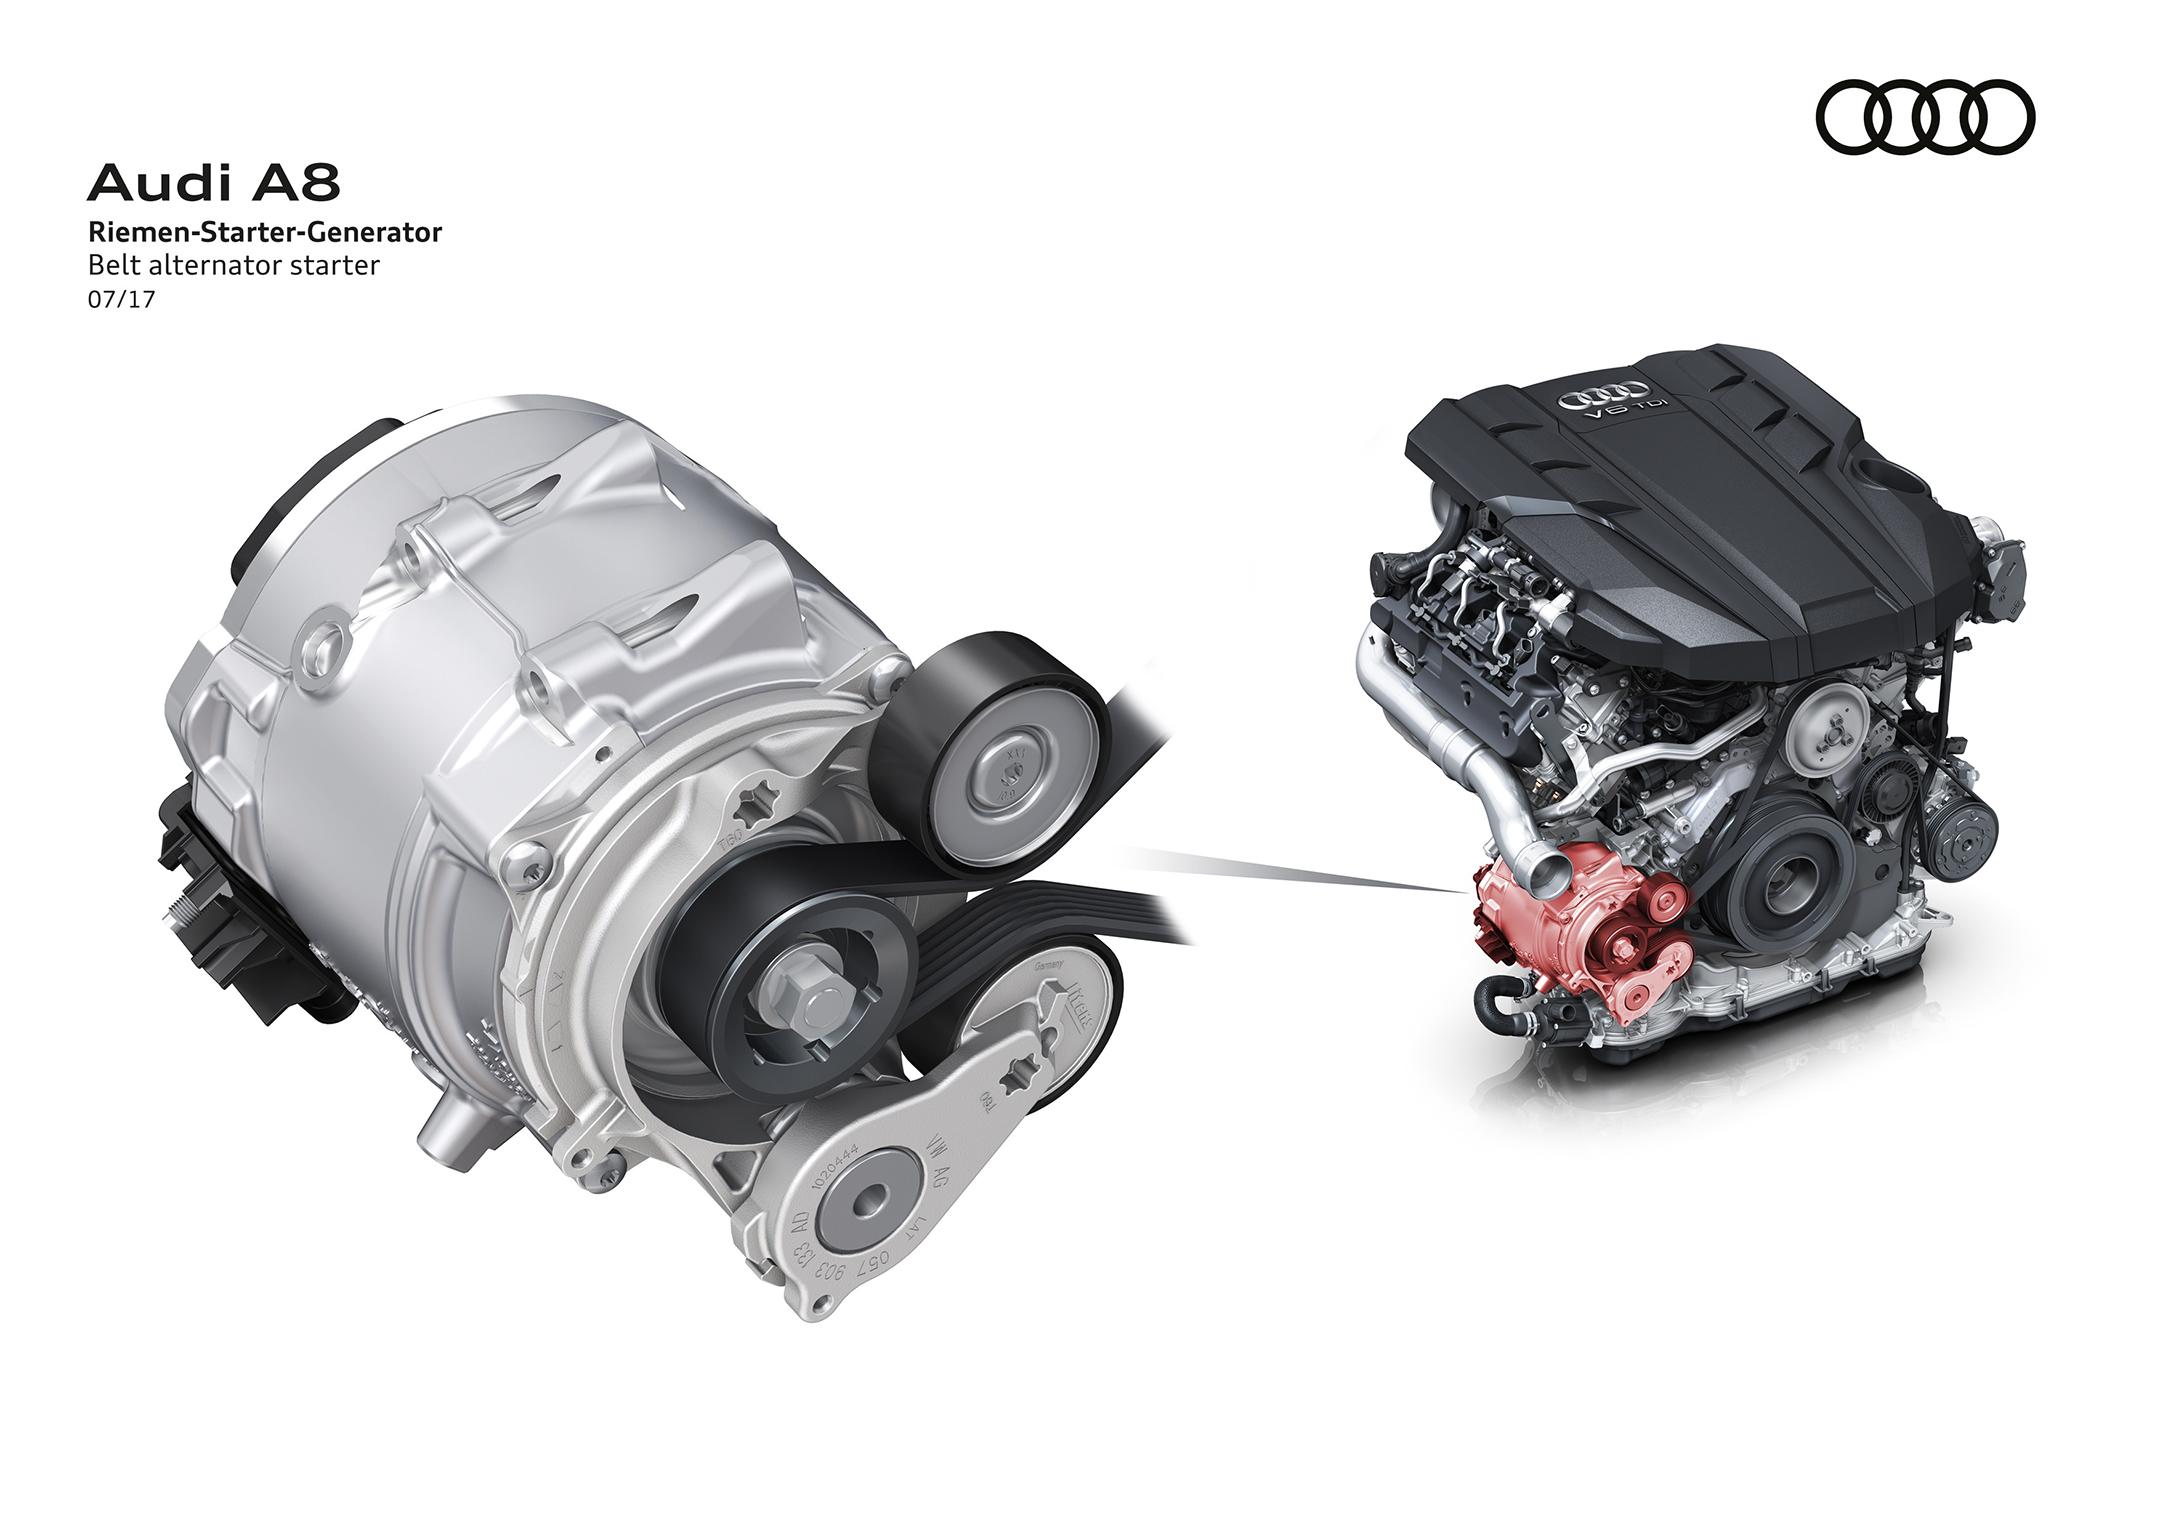 Audi A8 - 2017 - engine starter generator